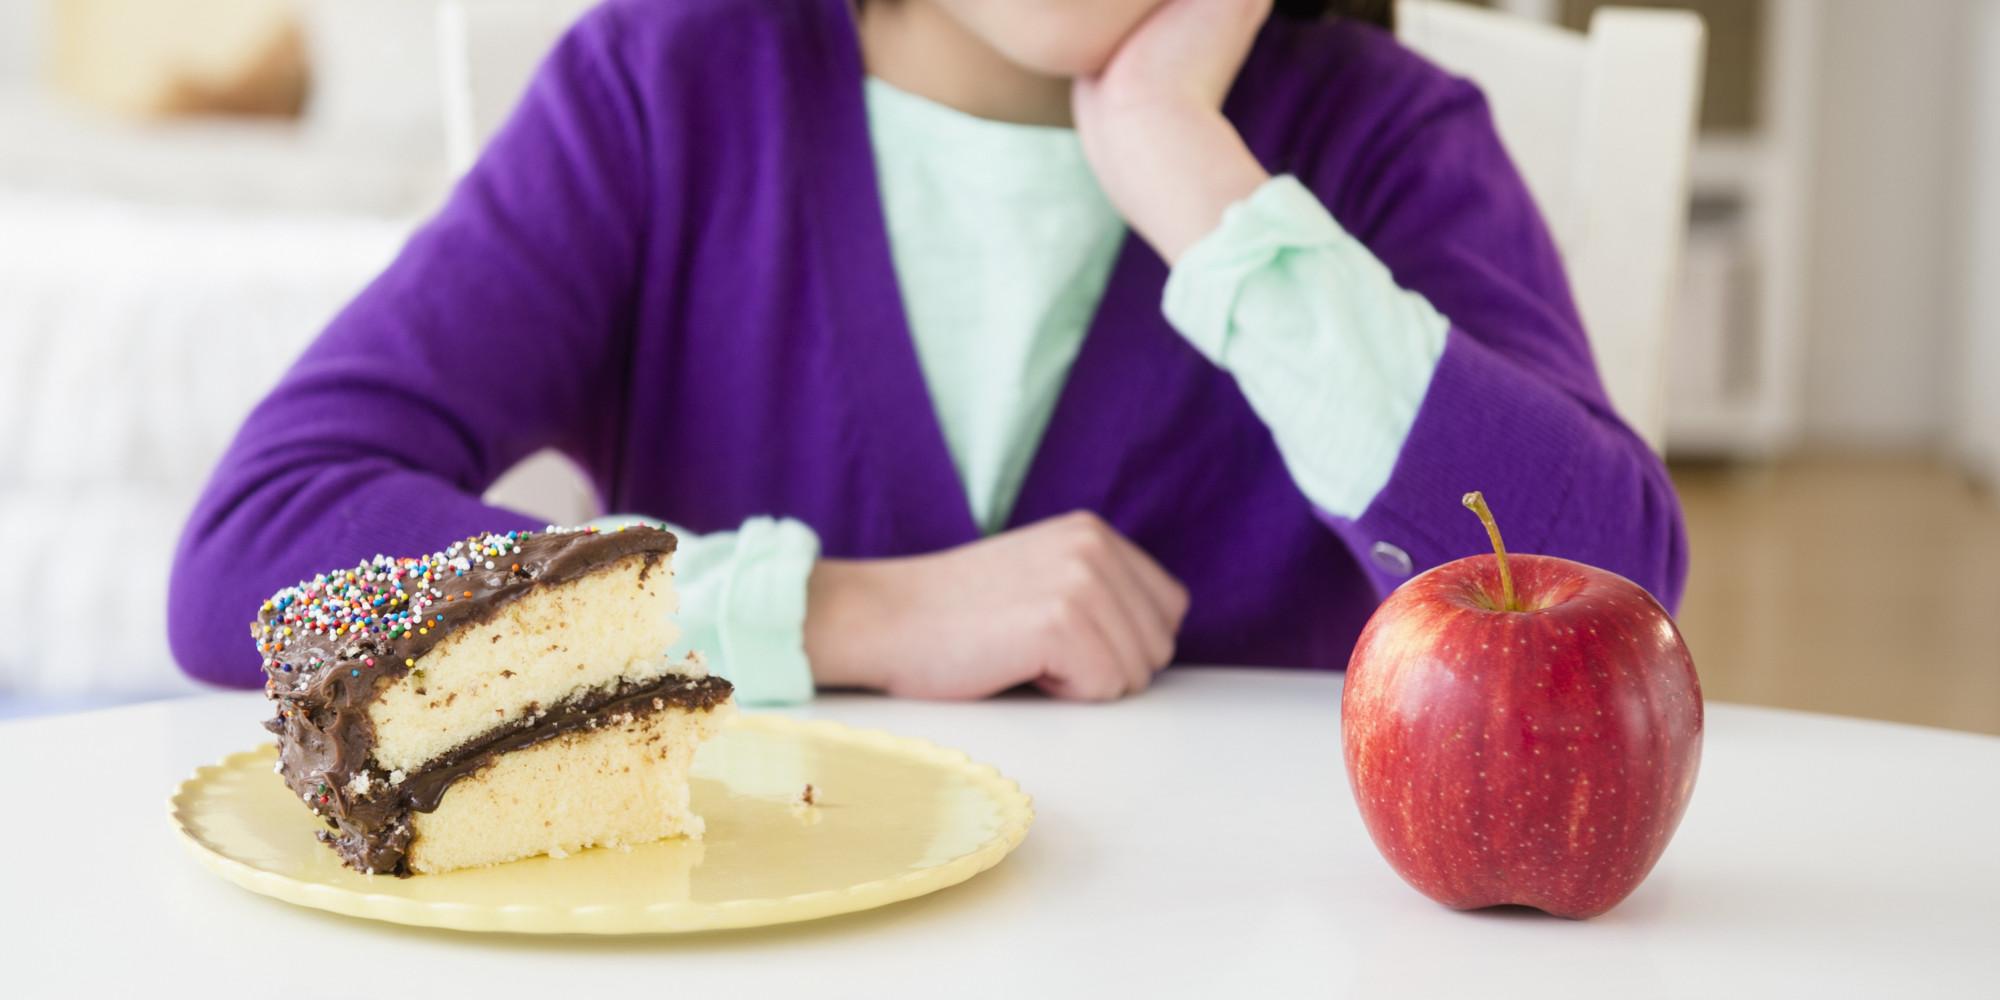 rational kuchen test, reversing childhood obesity: a new call to action | huffpost, Design ideen